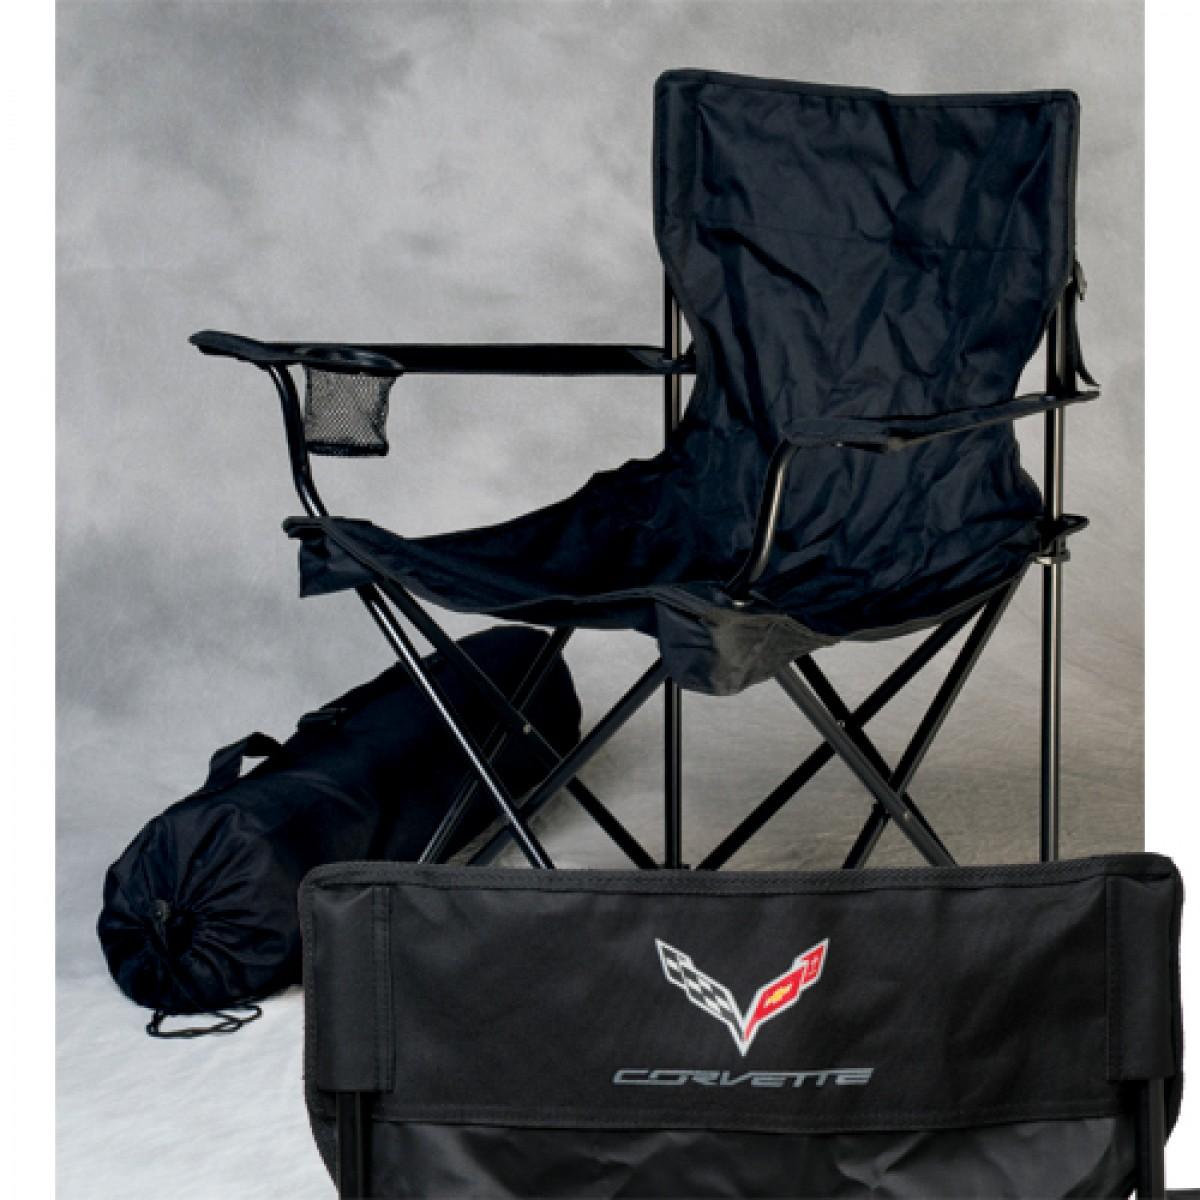 corvette seat office chair wooden captains bar stools hossrods c7 travel hot rod